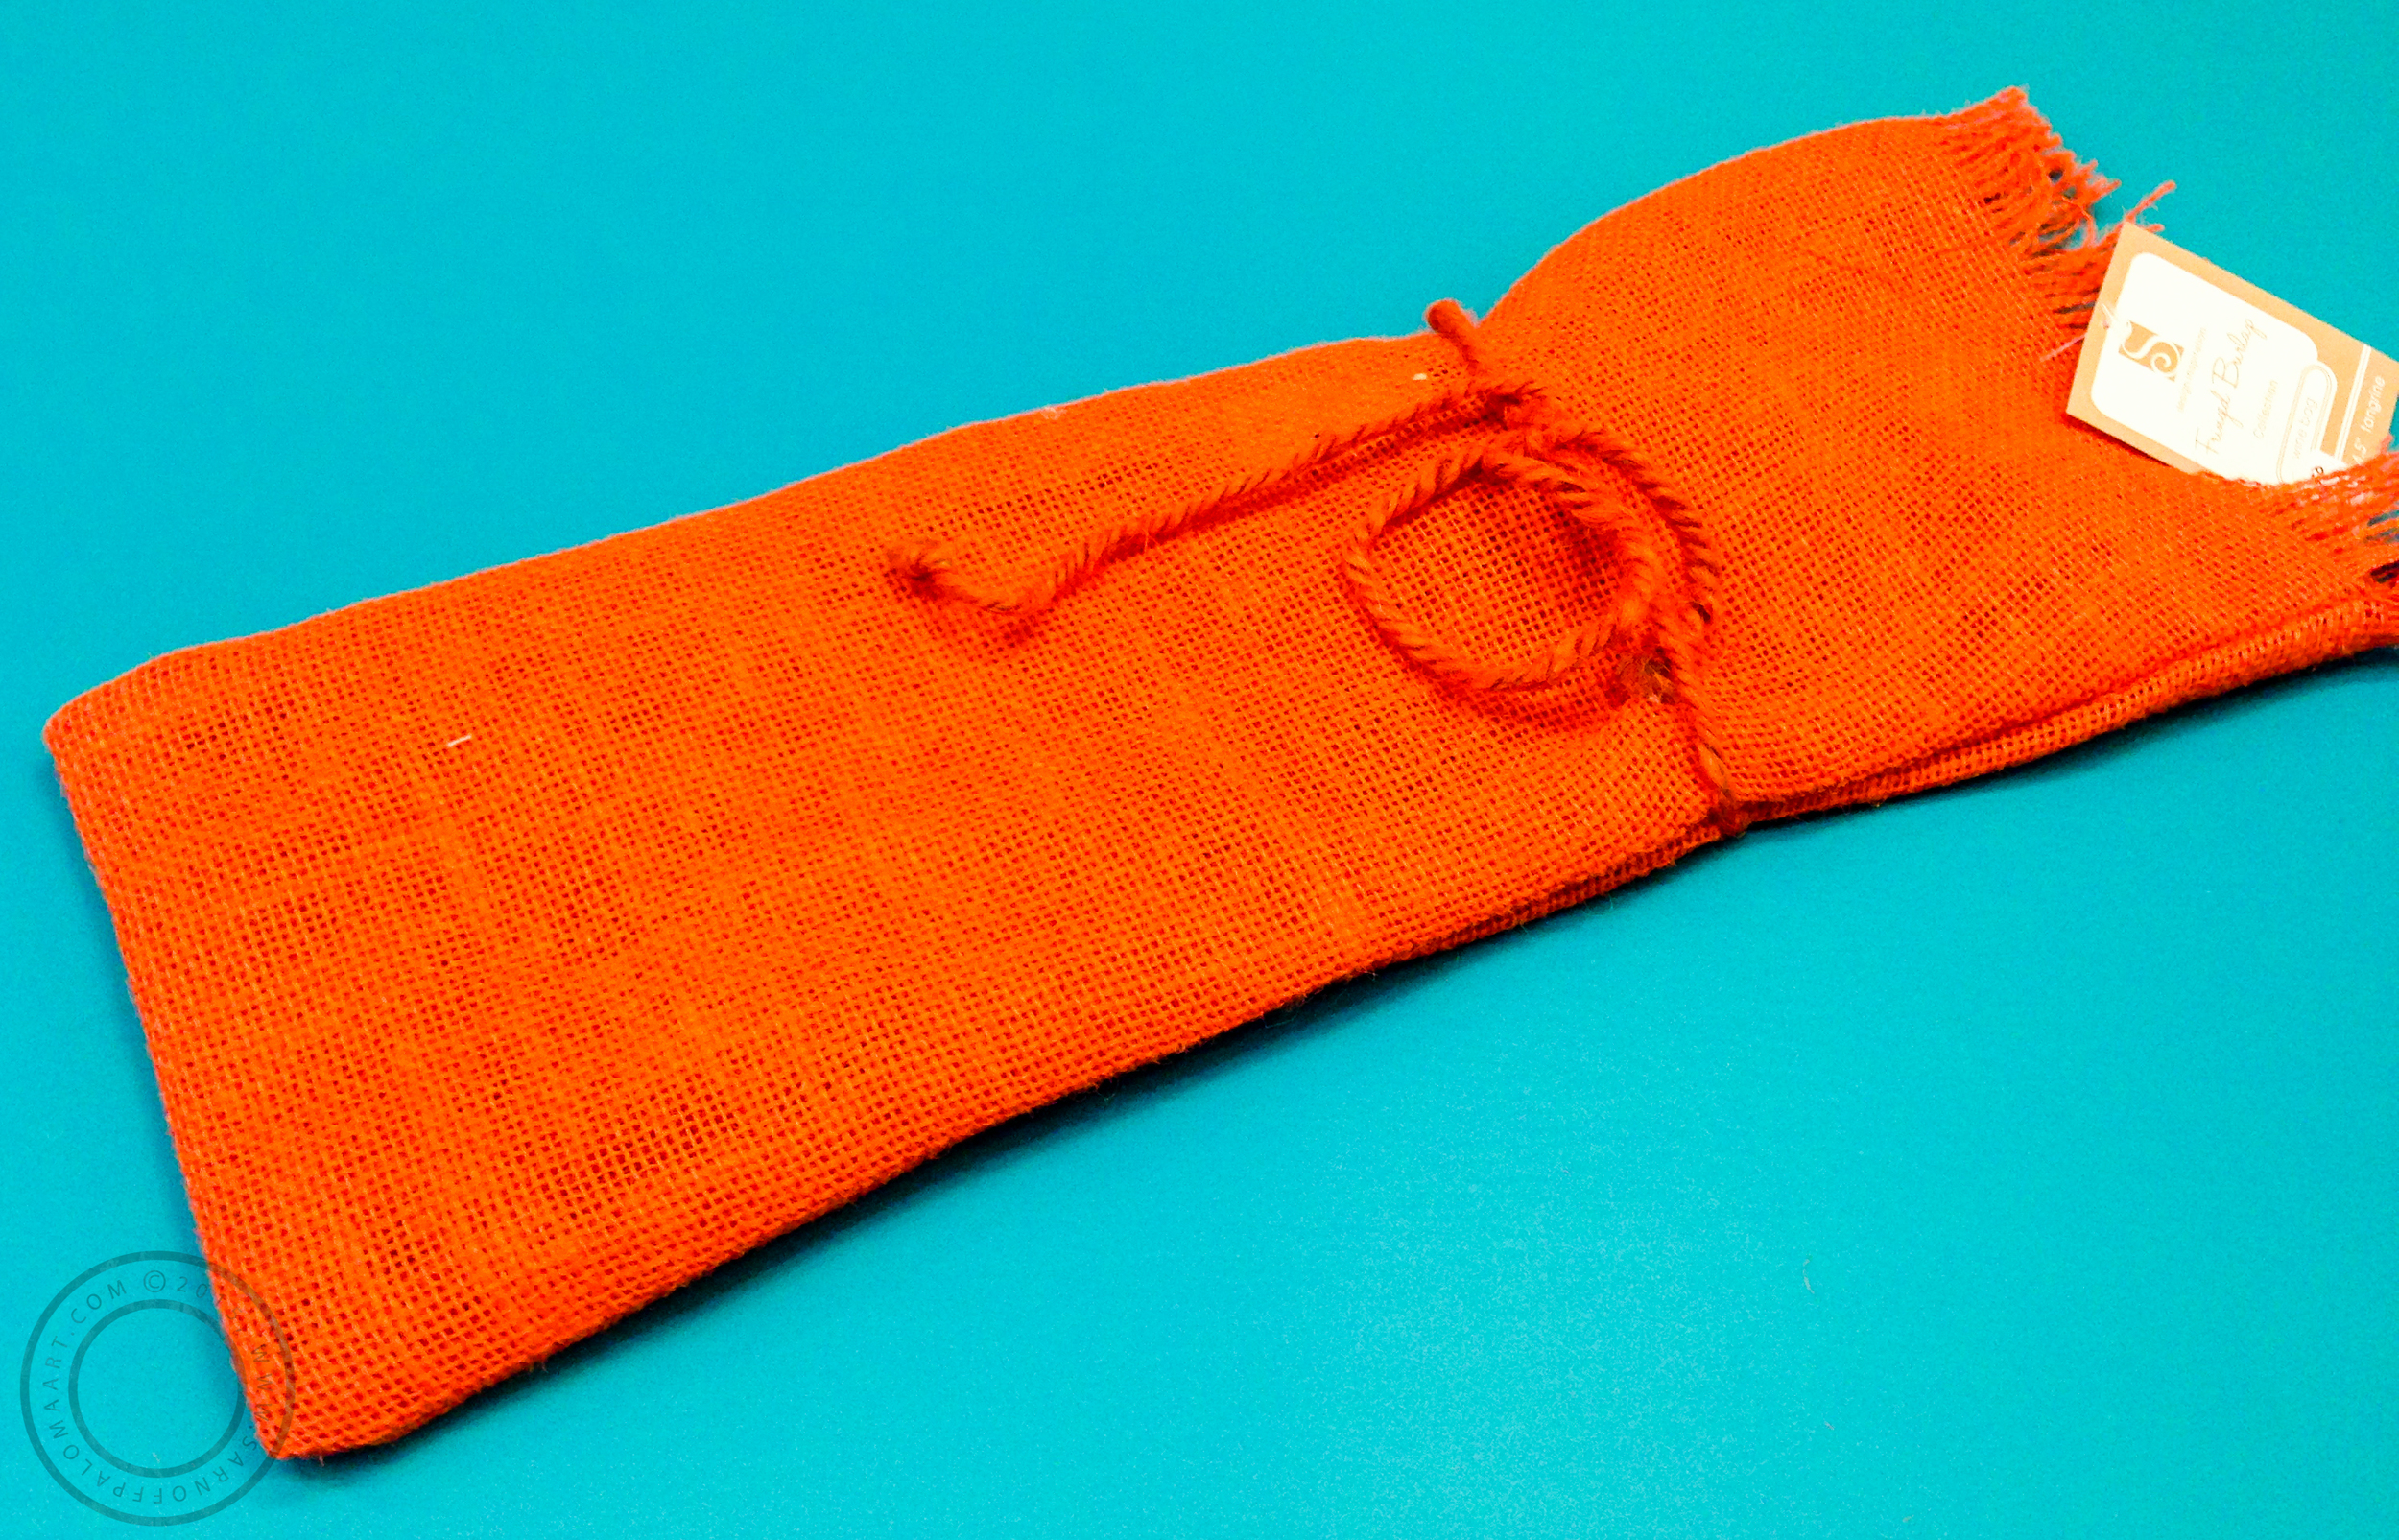 Tangerine wine bag by S Design inspiration- $5.50